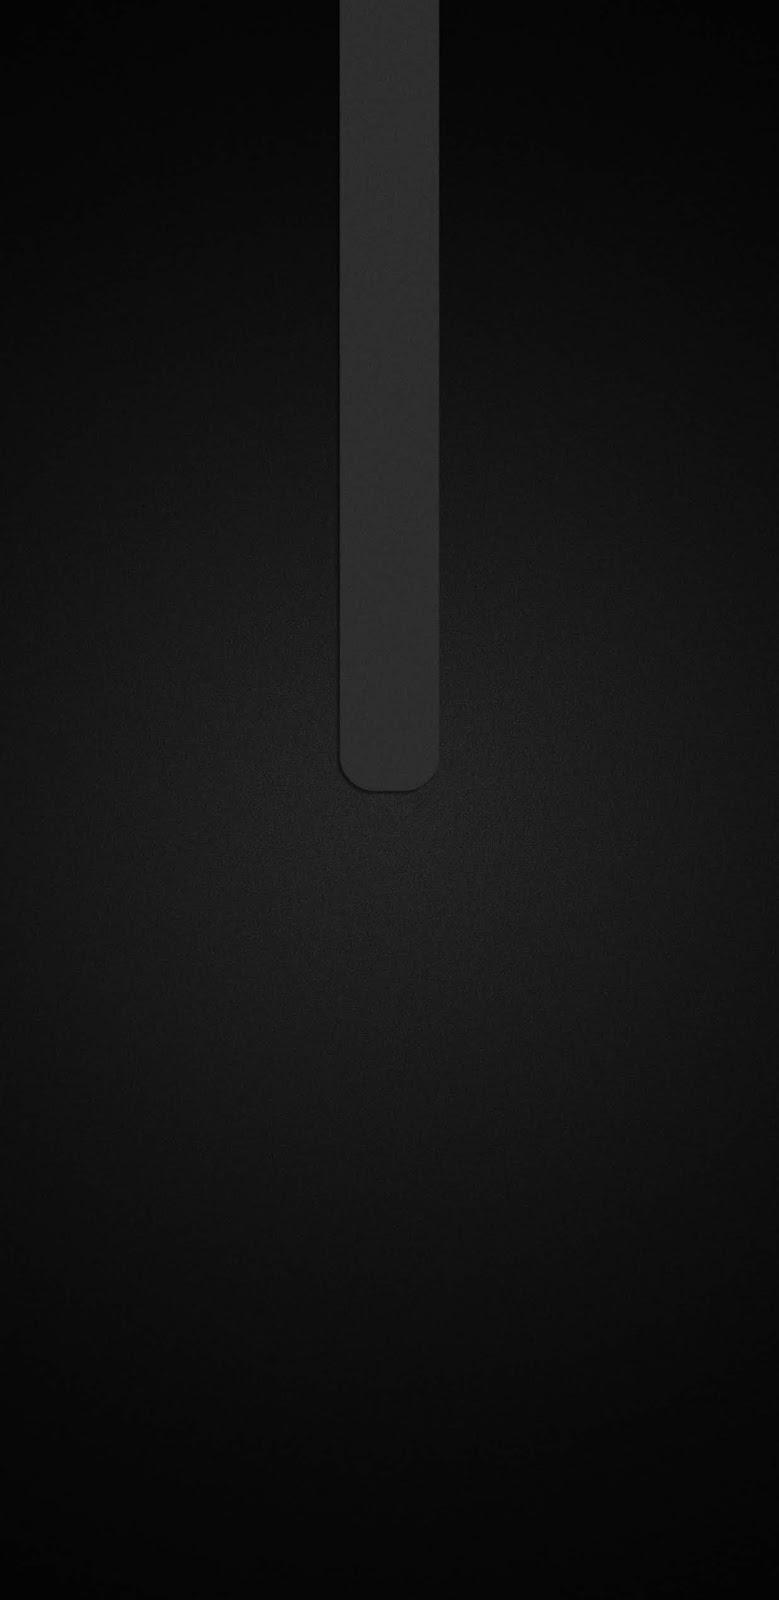 flat dark iphone wallpaper